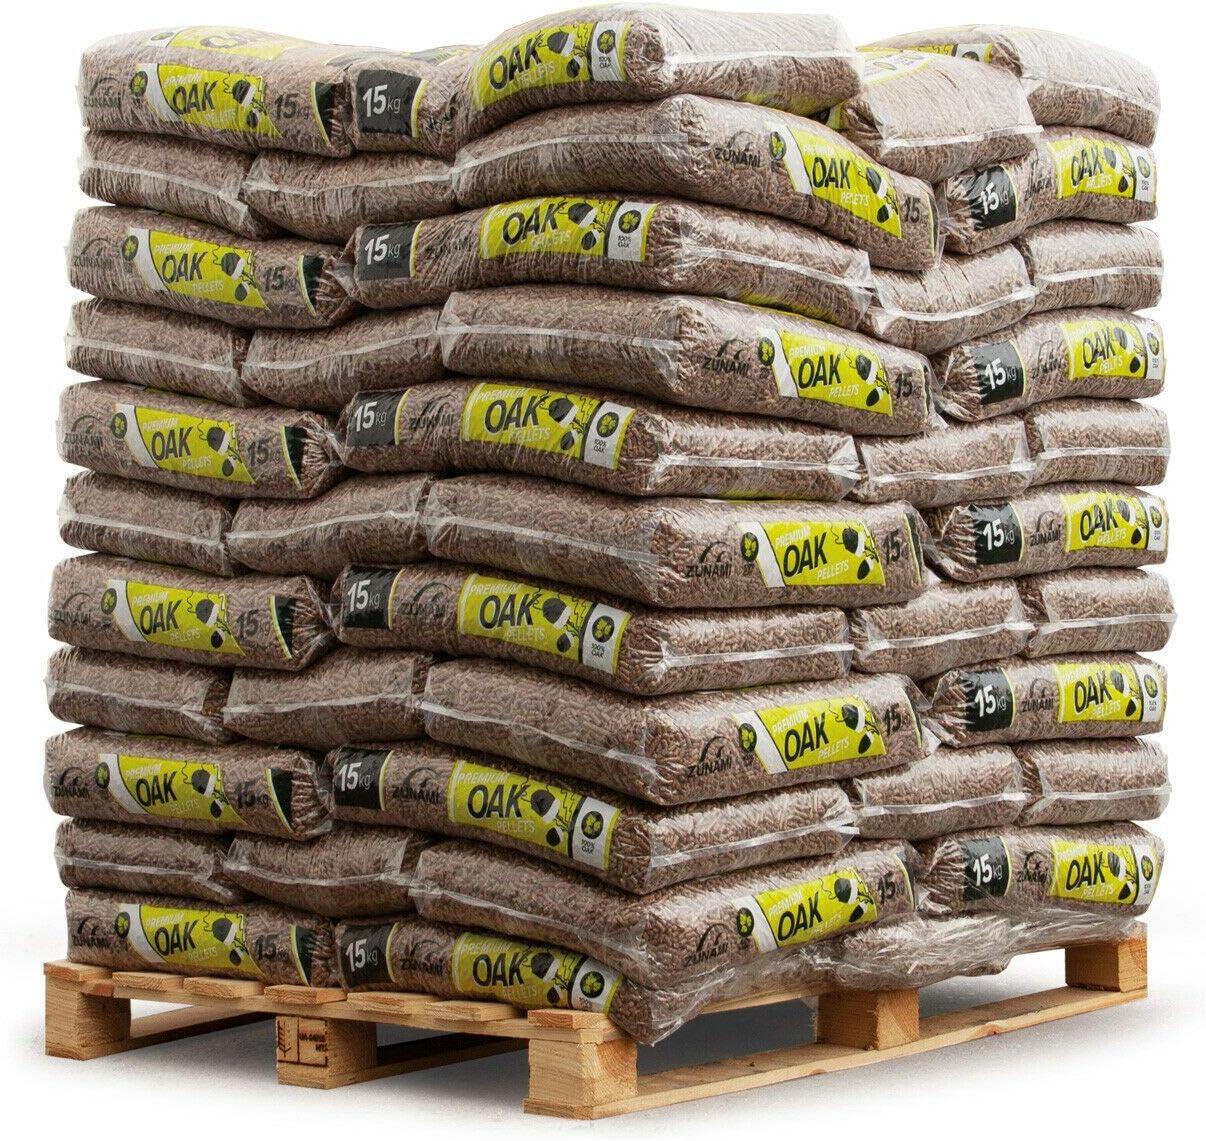 PALIGO Holzpellets Oak Heizpellets Hartholz Eiche Wood Pellet /Öko Energie Heizung Kessel Sackware 6mm 15kg x 65 Sack 975kg 1 Palette Zunami